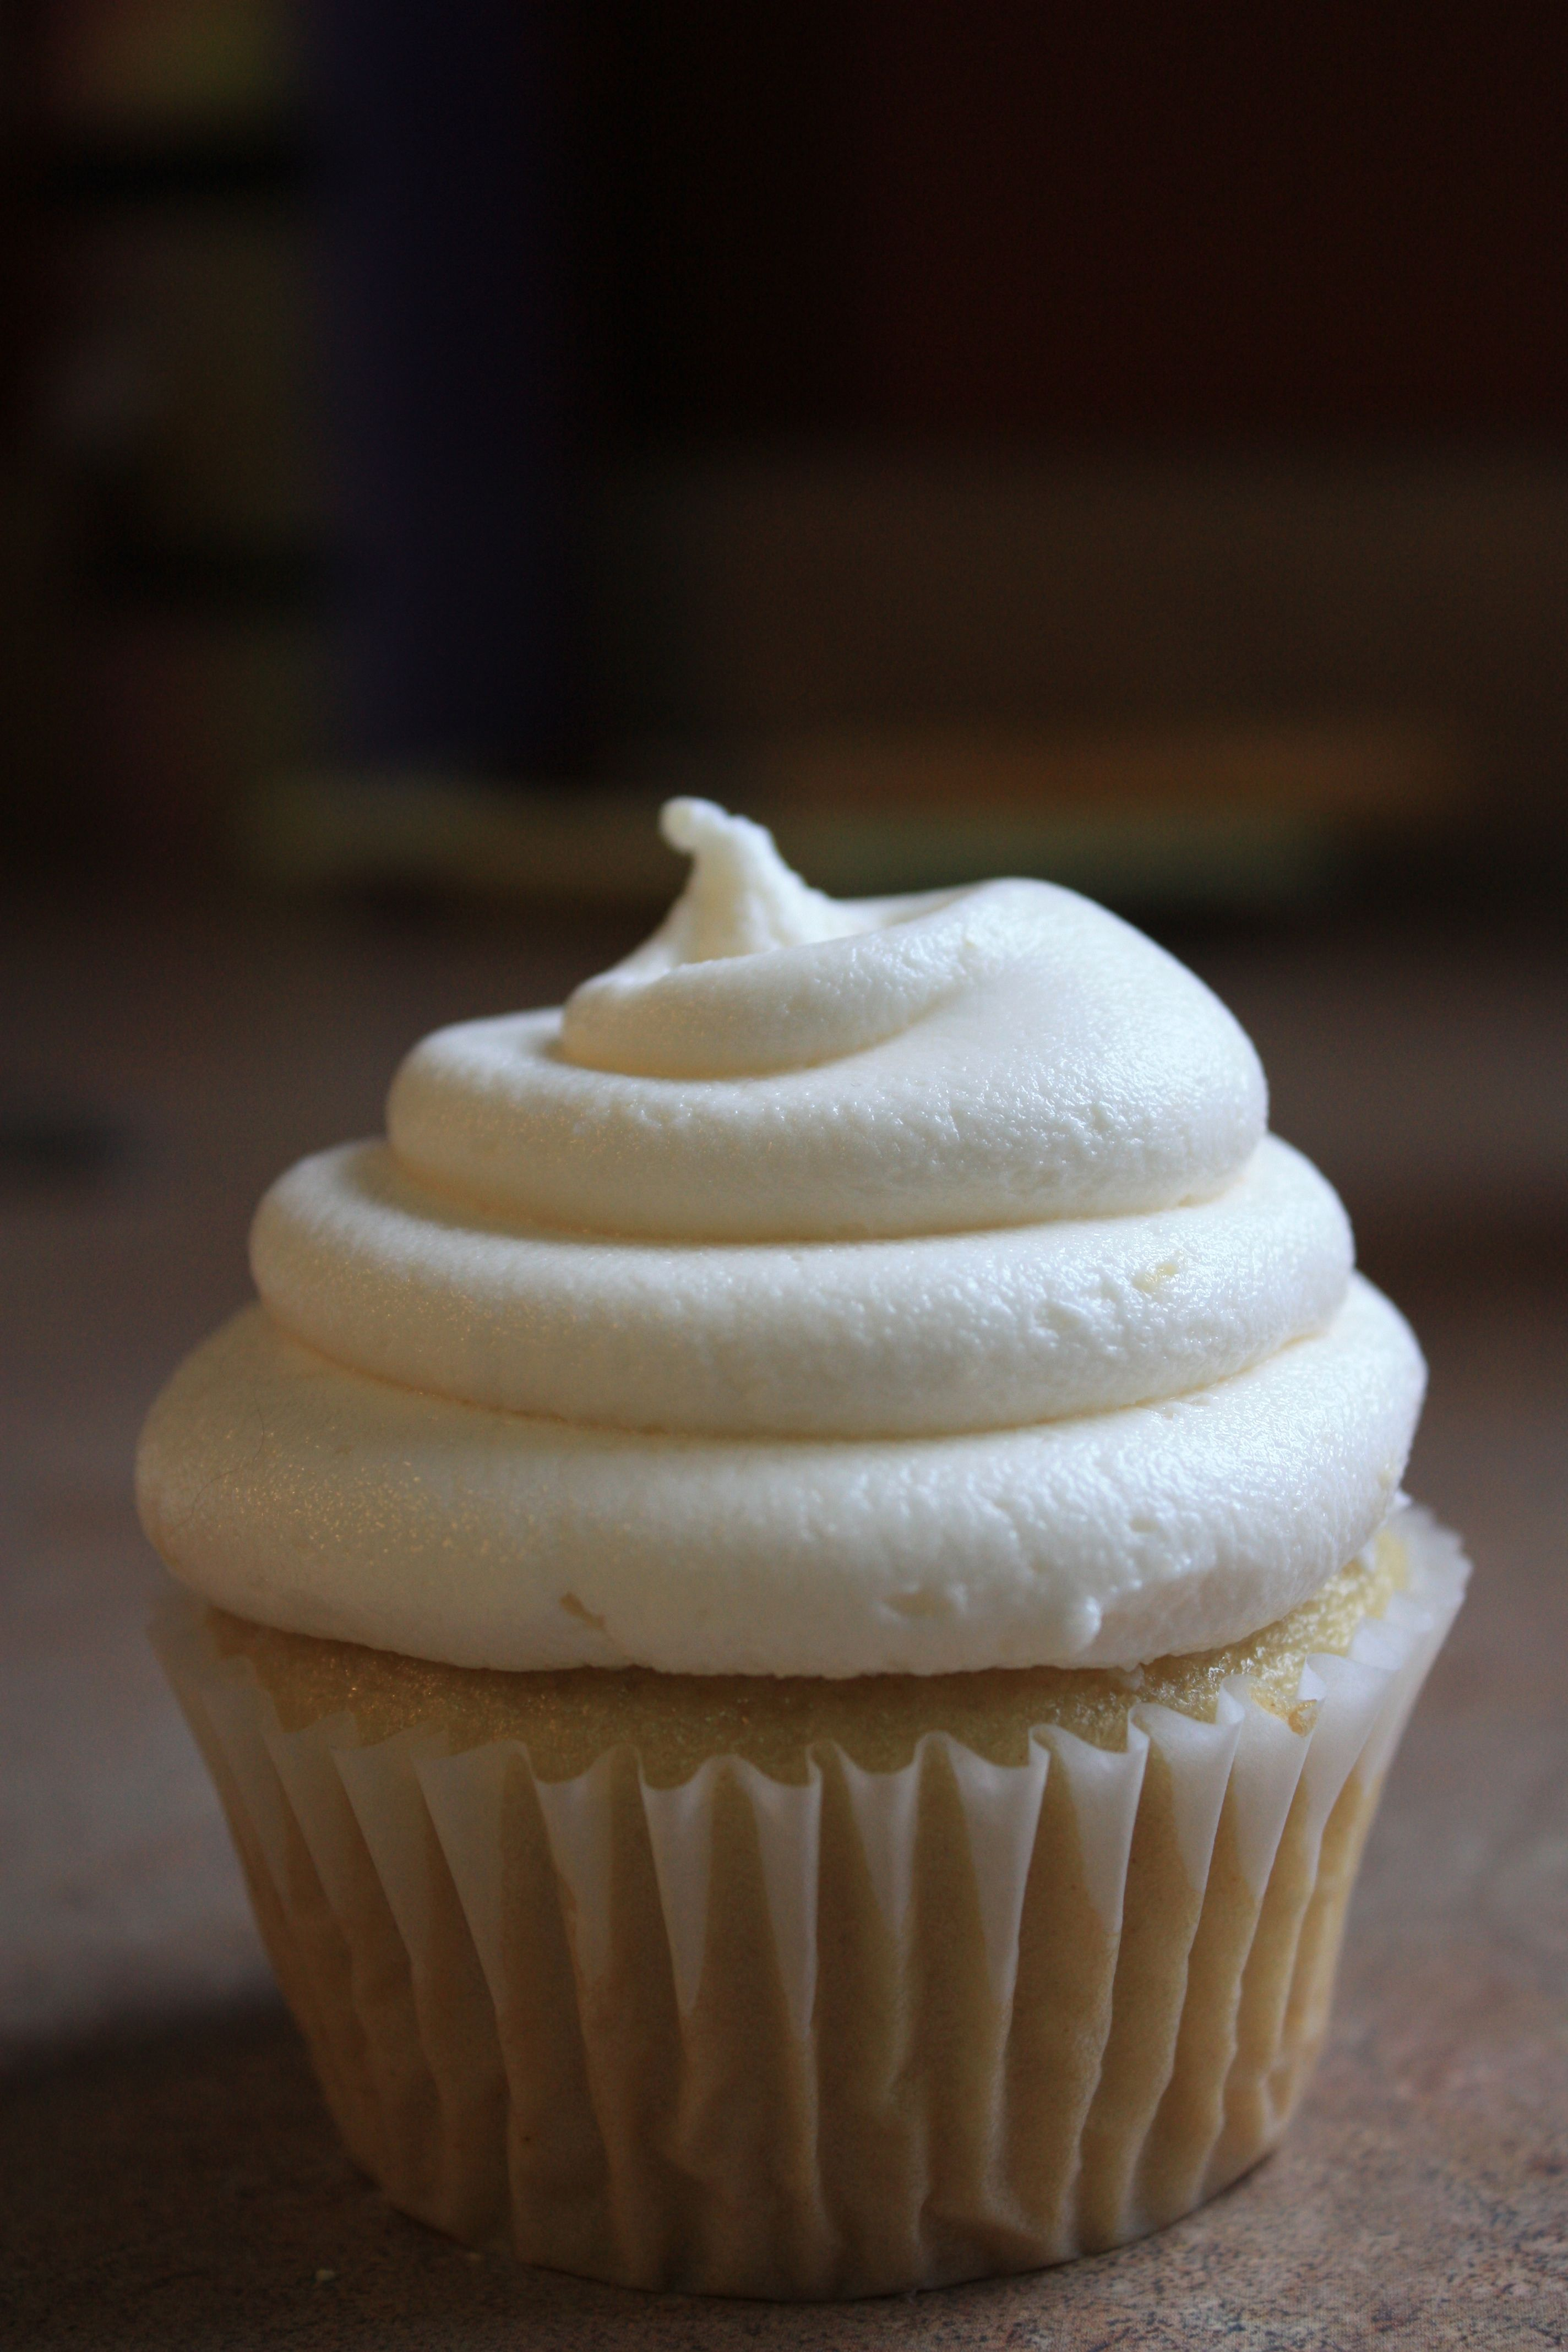 Vegan Vanilla Cupcake Vegan Vanilla Cupcakes Vegan Sweets Dessert Recipes